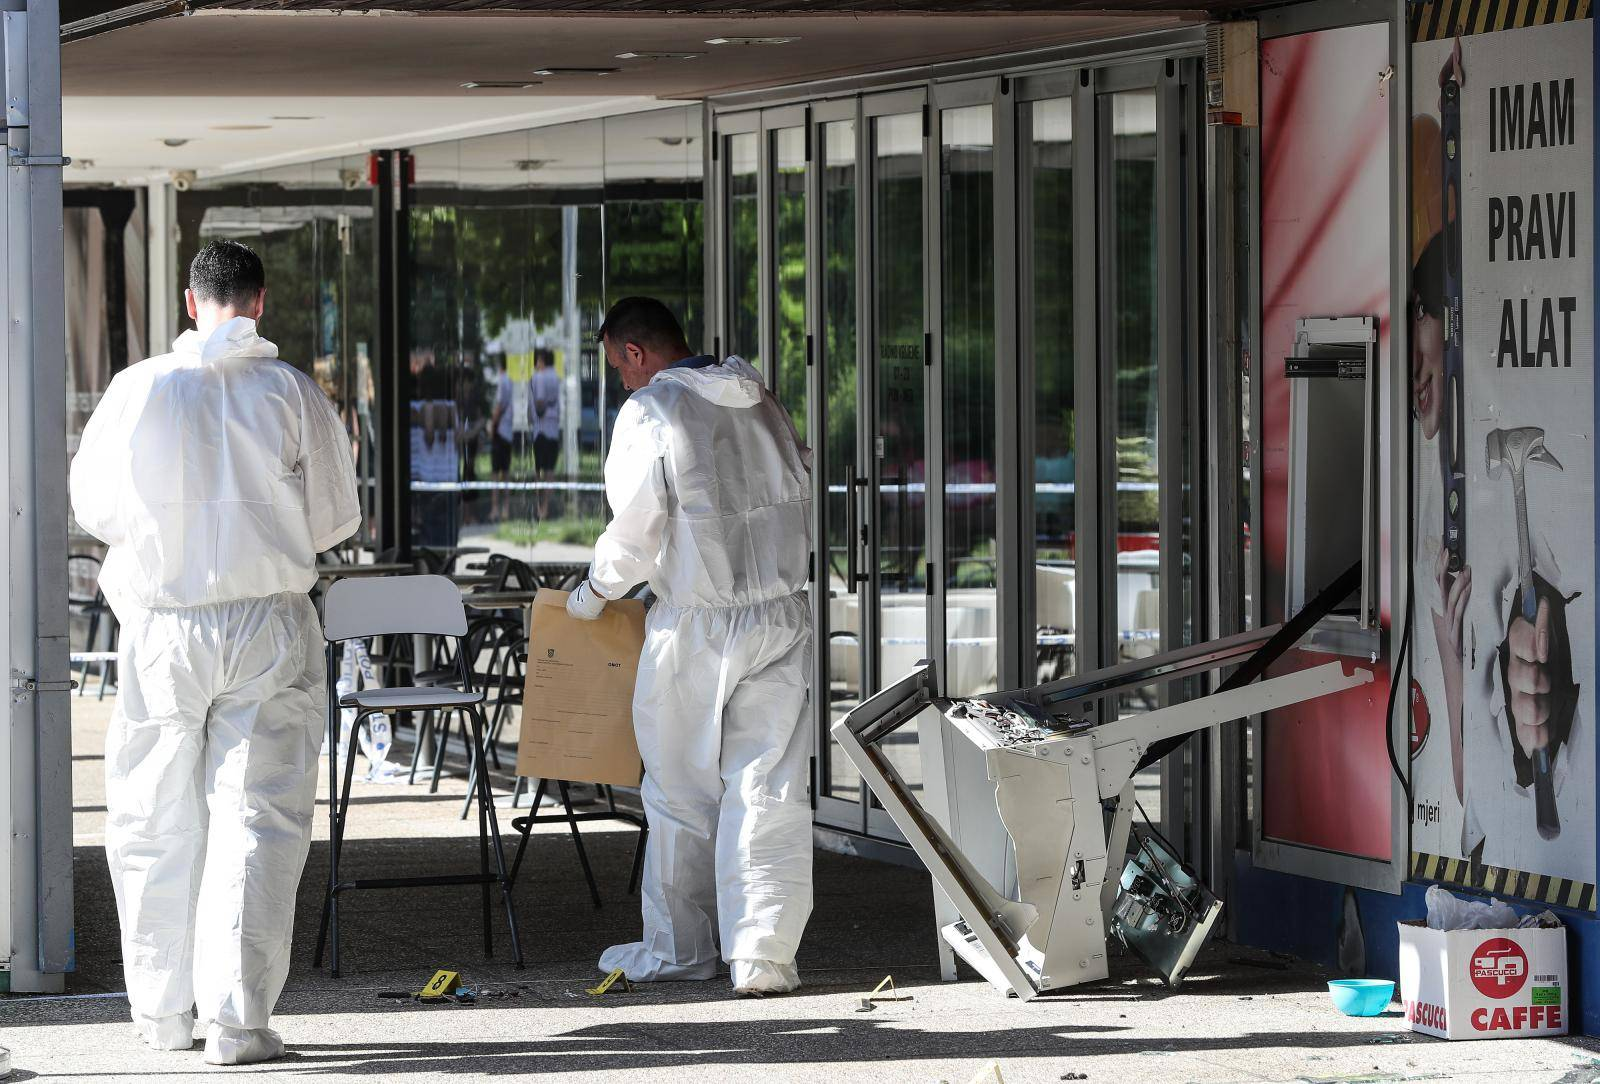 Zagreb: U Trnskom raznesen bankomat, policija obavlja očevid